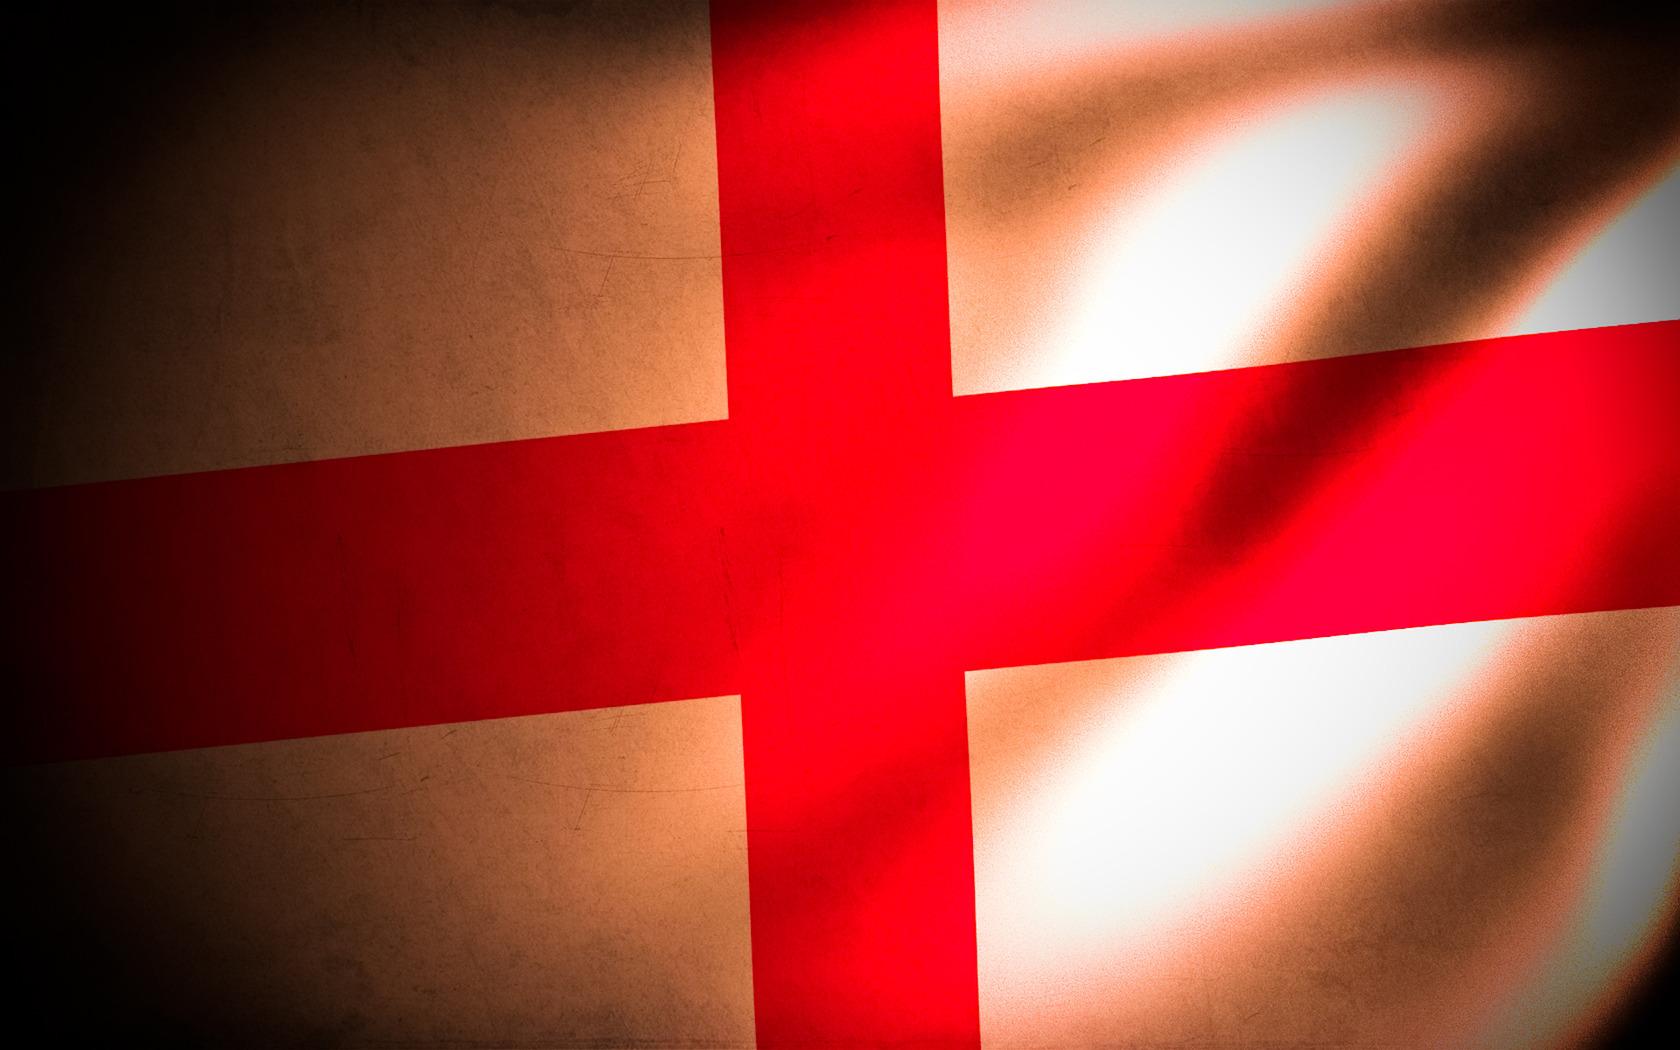 Flag of England wallpaper 13825 1680x1050